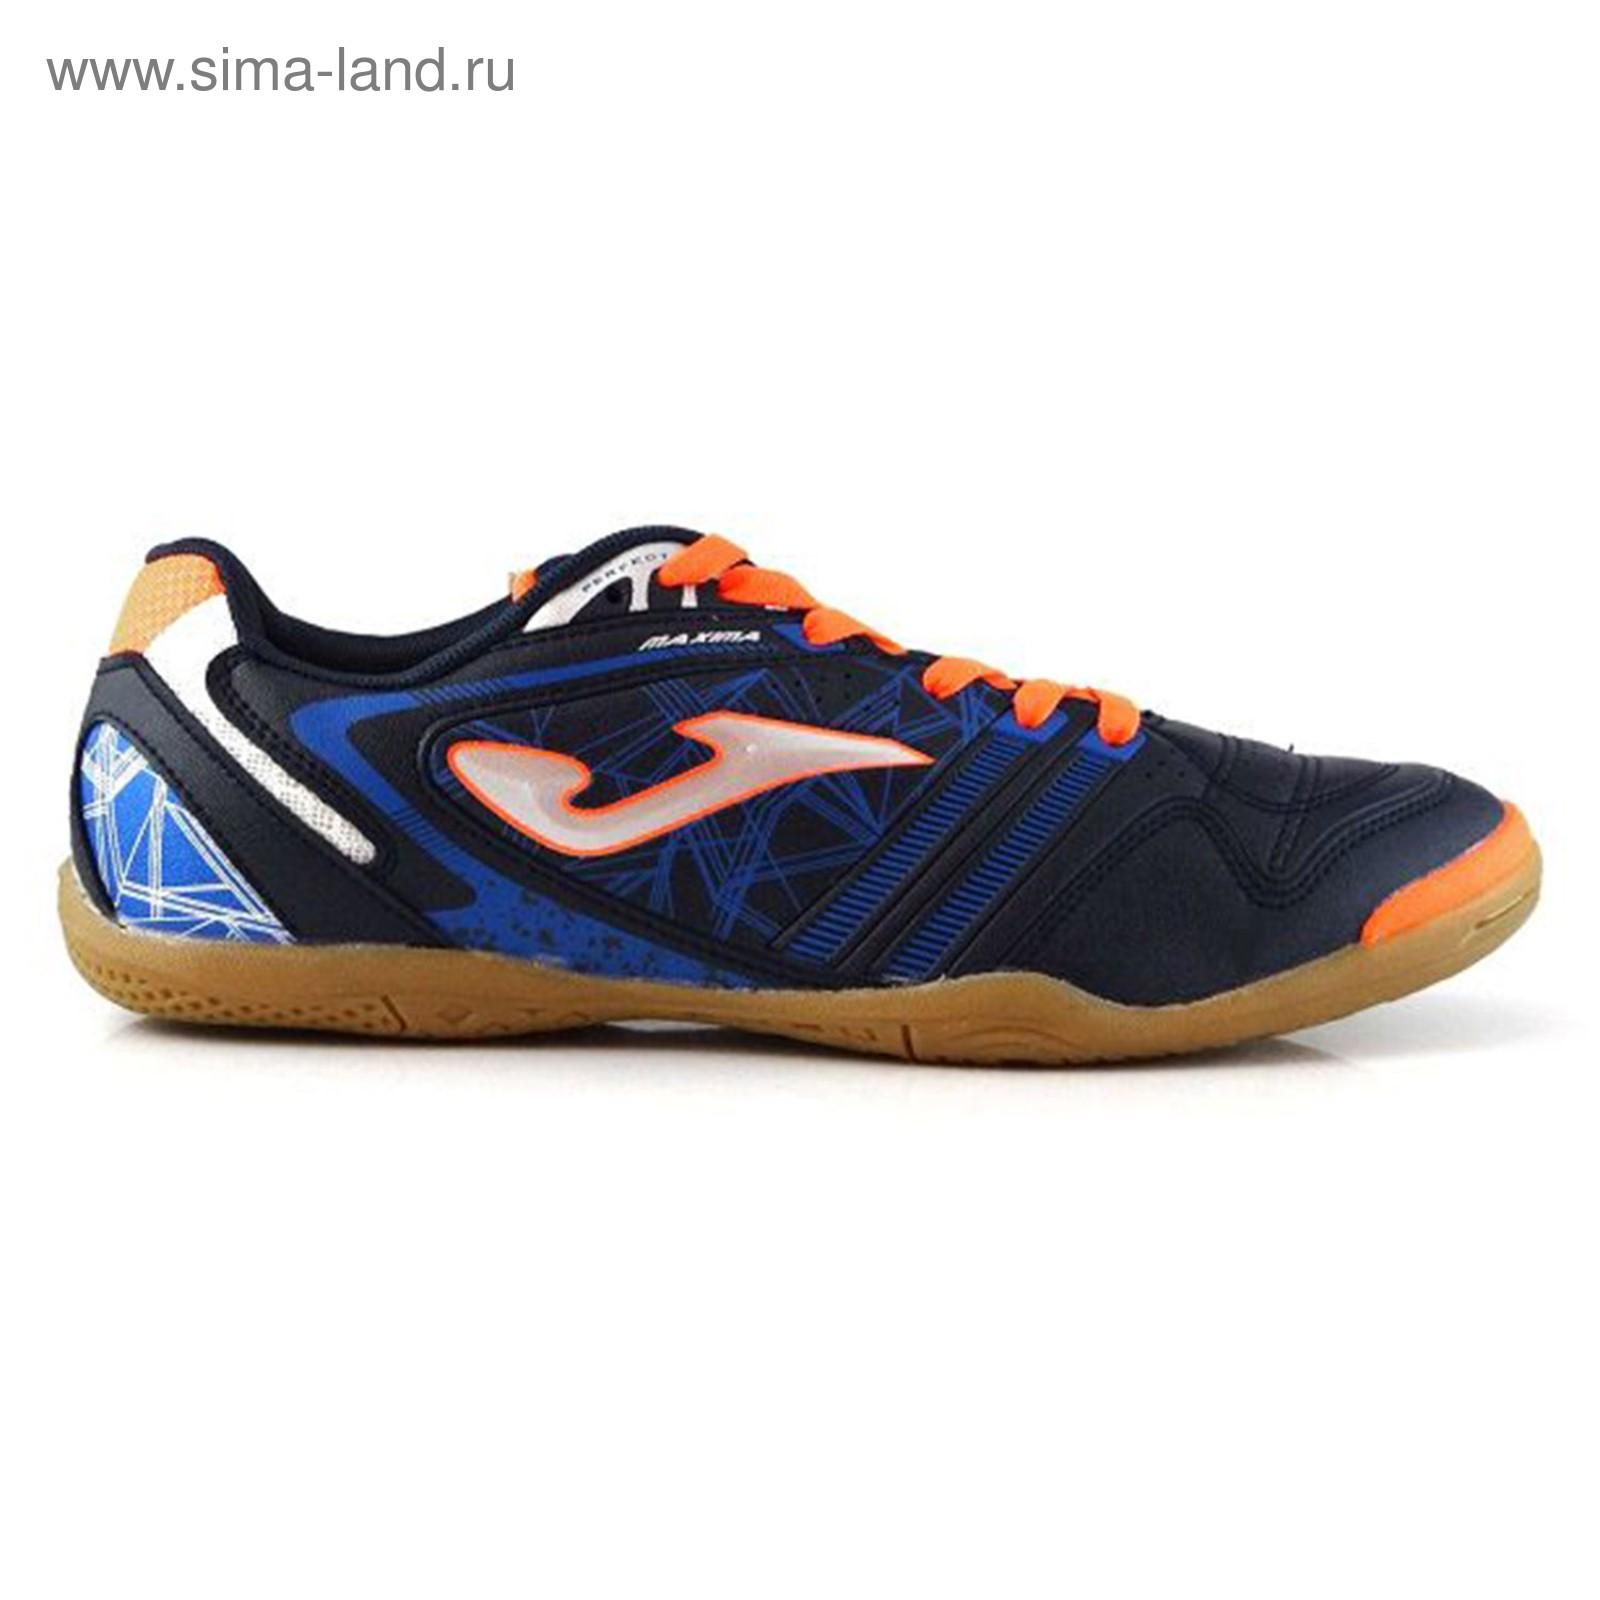 346937ac436db9 Футзалки Joma MAXIMA MAXW.803.IN 39 EUR (4148555) - Купить по цене ...